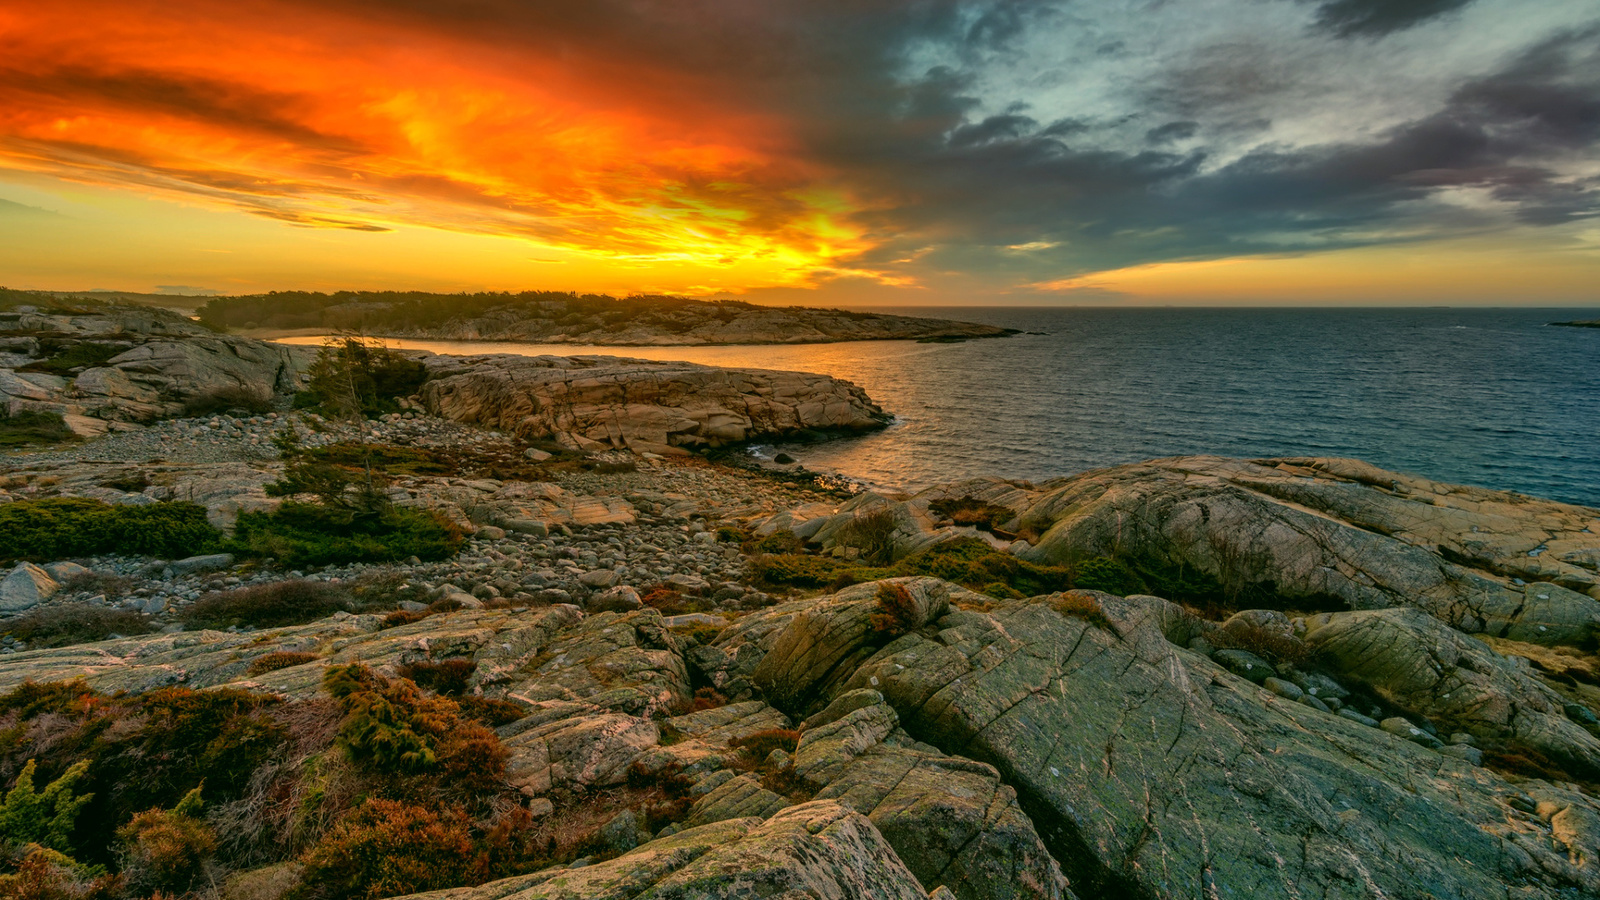 берег, скалы, море, небо, закат